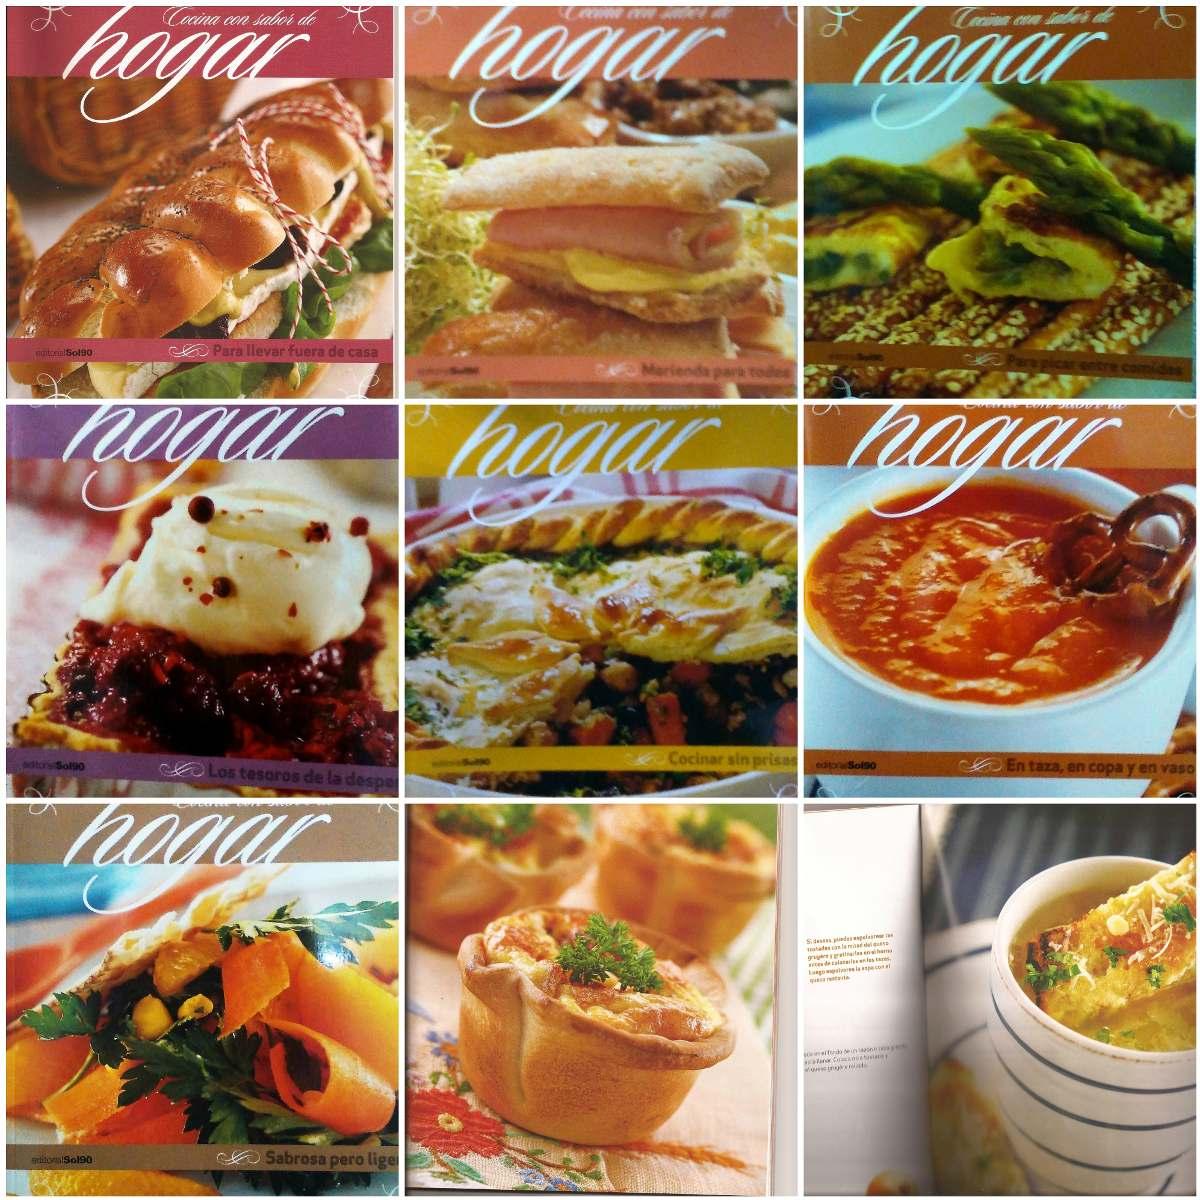 Recetas Fáciles De Cocina Variadas Tips Consejos Libro